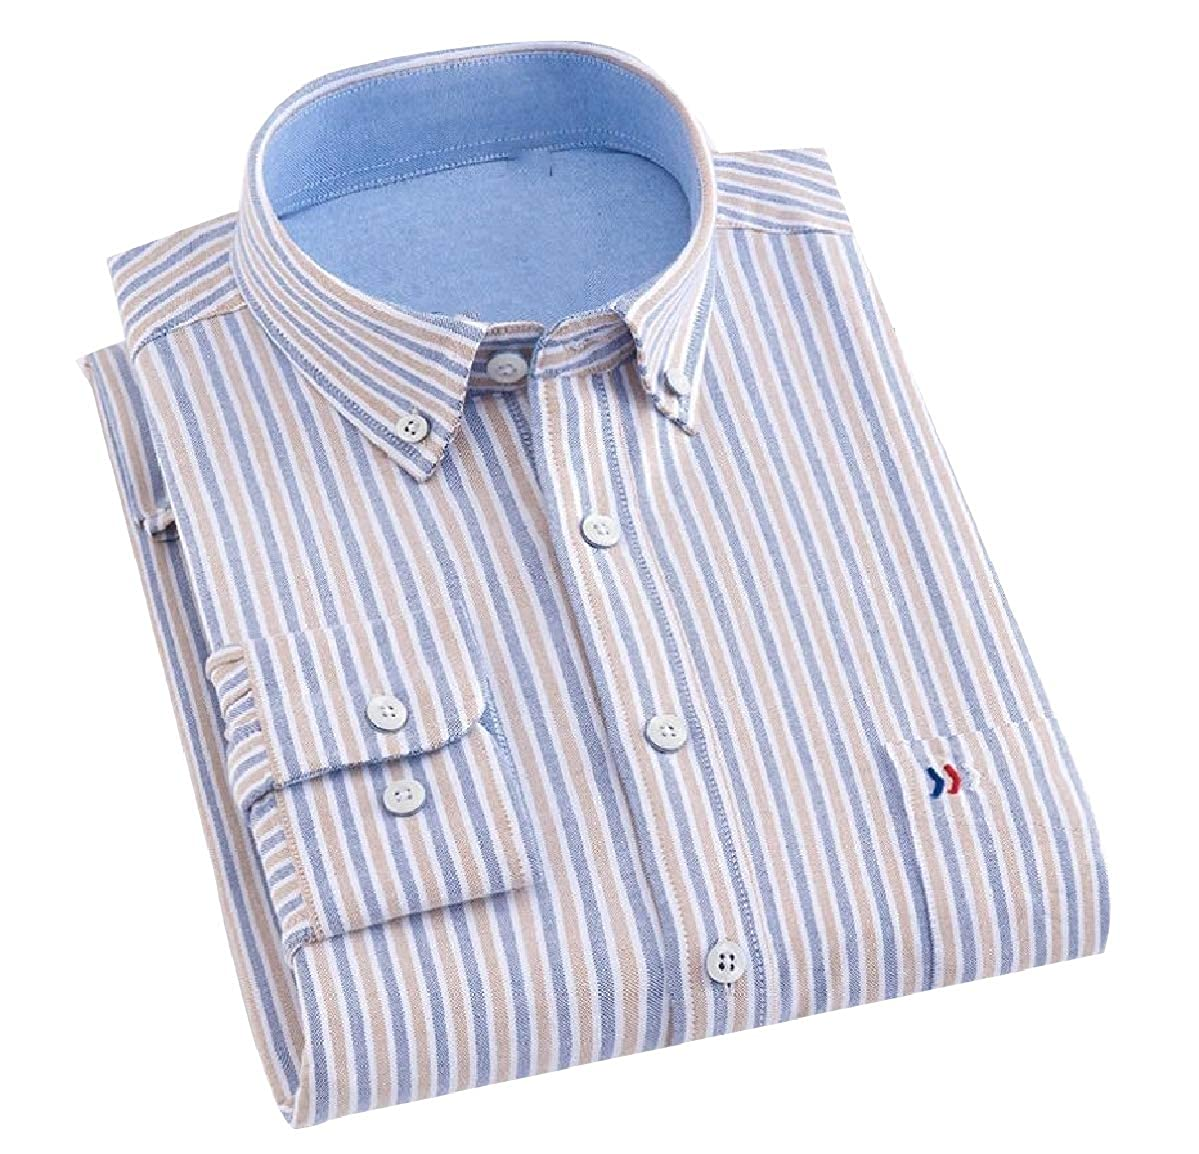 Mfasica Men Plaid Slim Fit Spread Collar Long-Sleeve Premium Woven Shirt